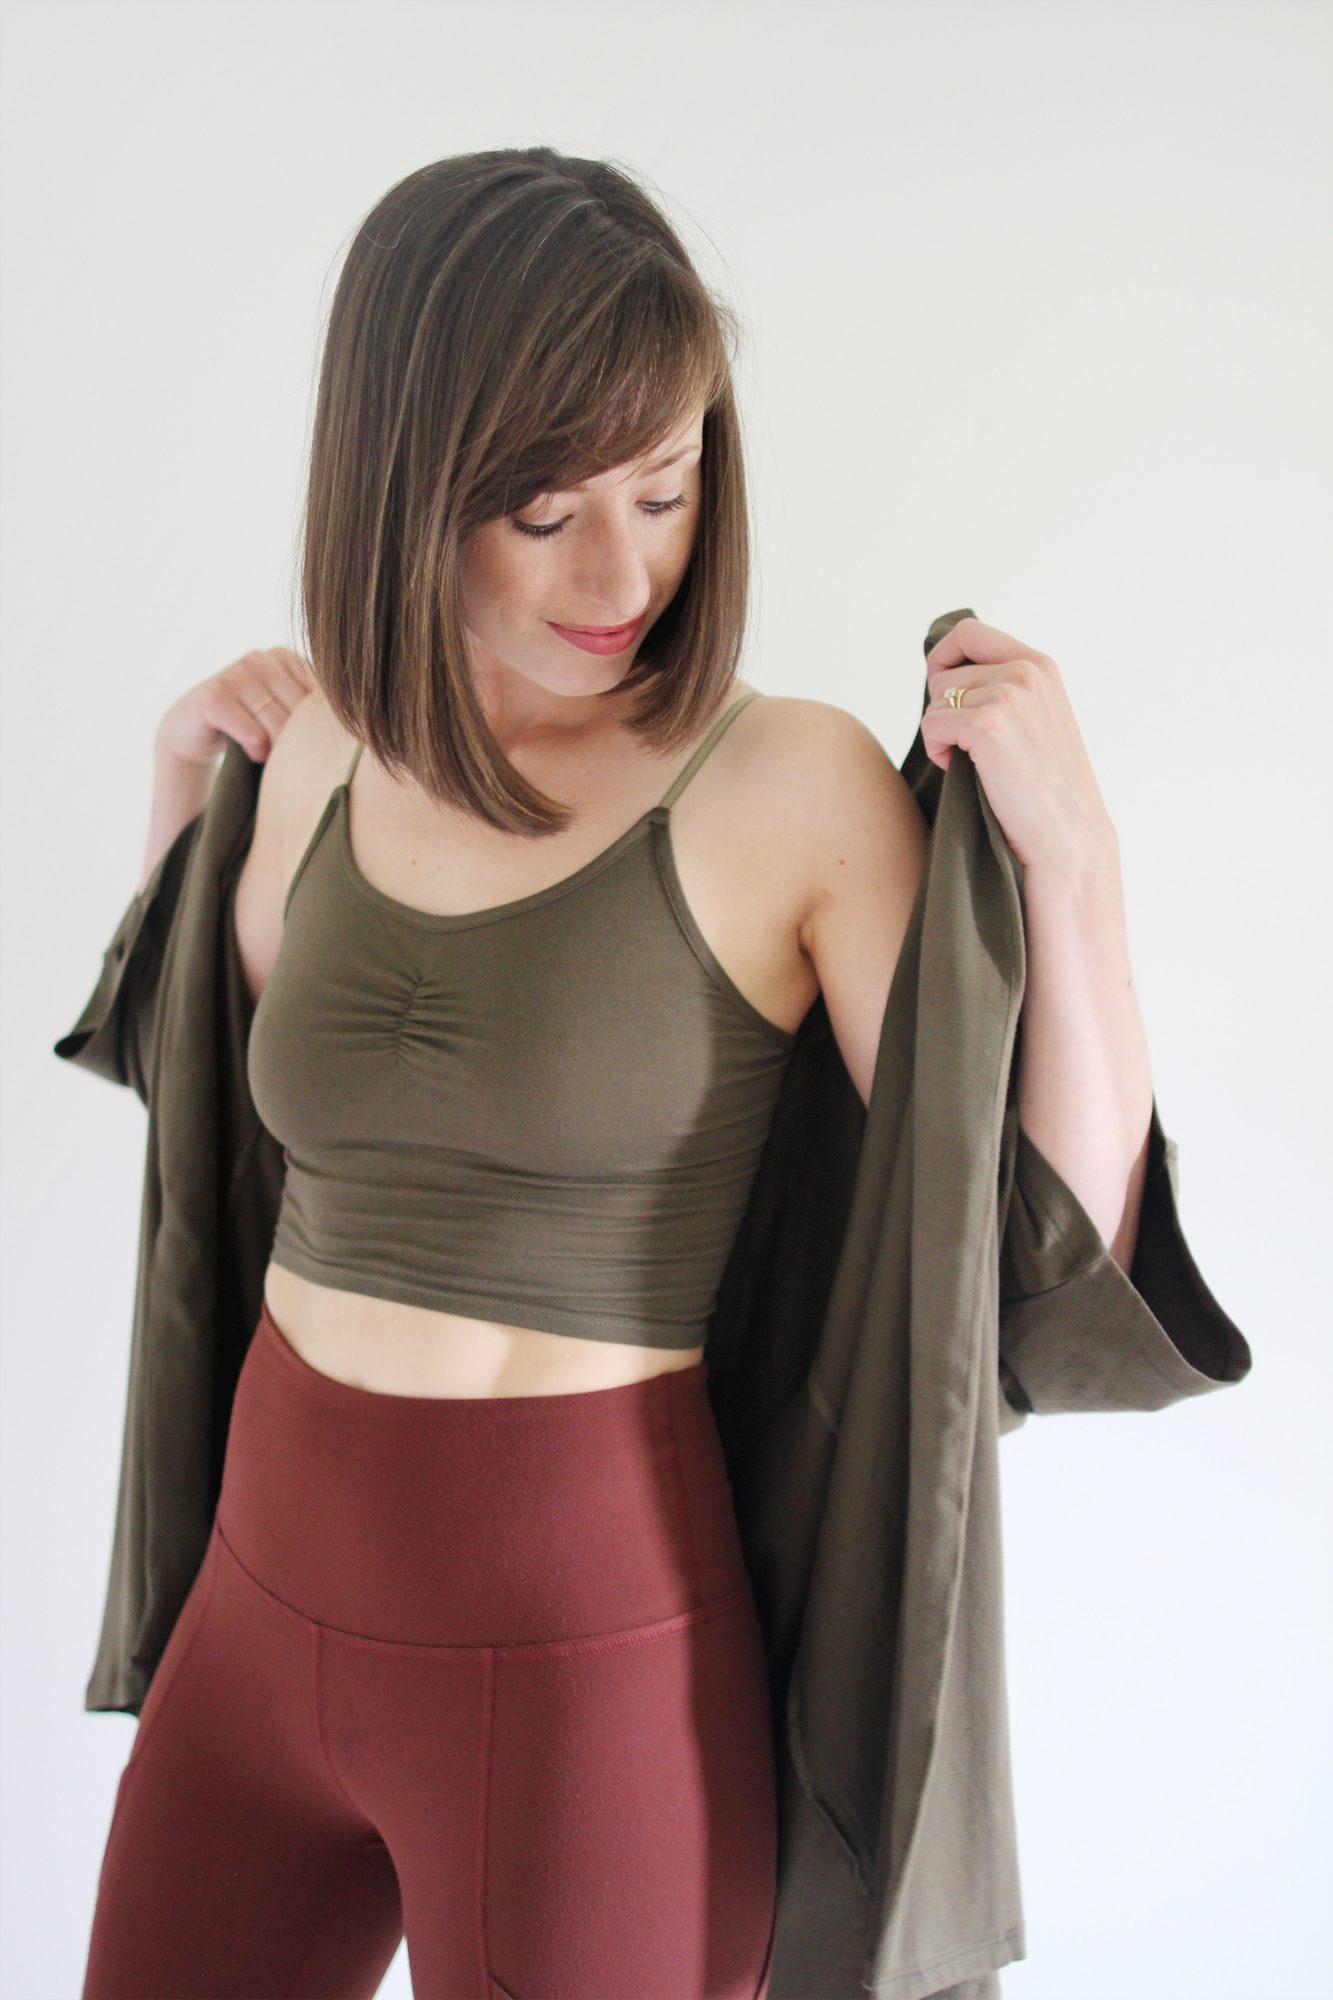 Style Bee - Summer 10x10 - Activewear Edition - Look 2